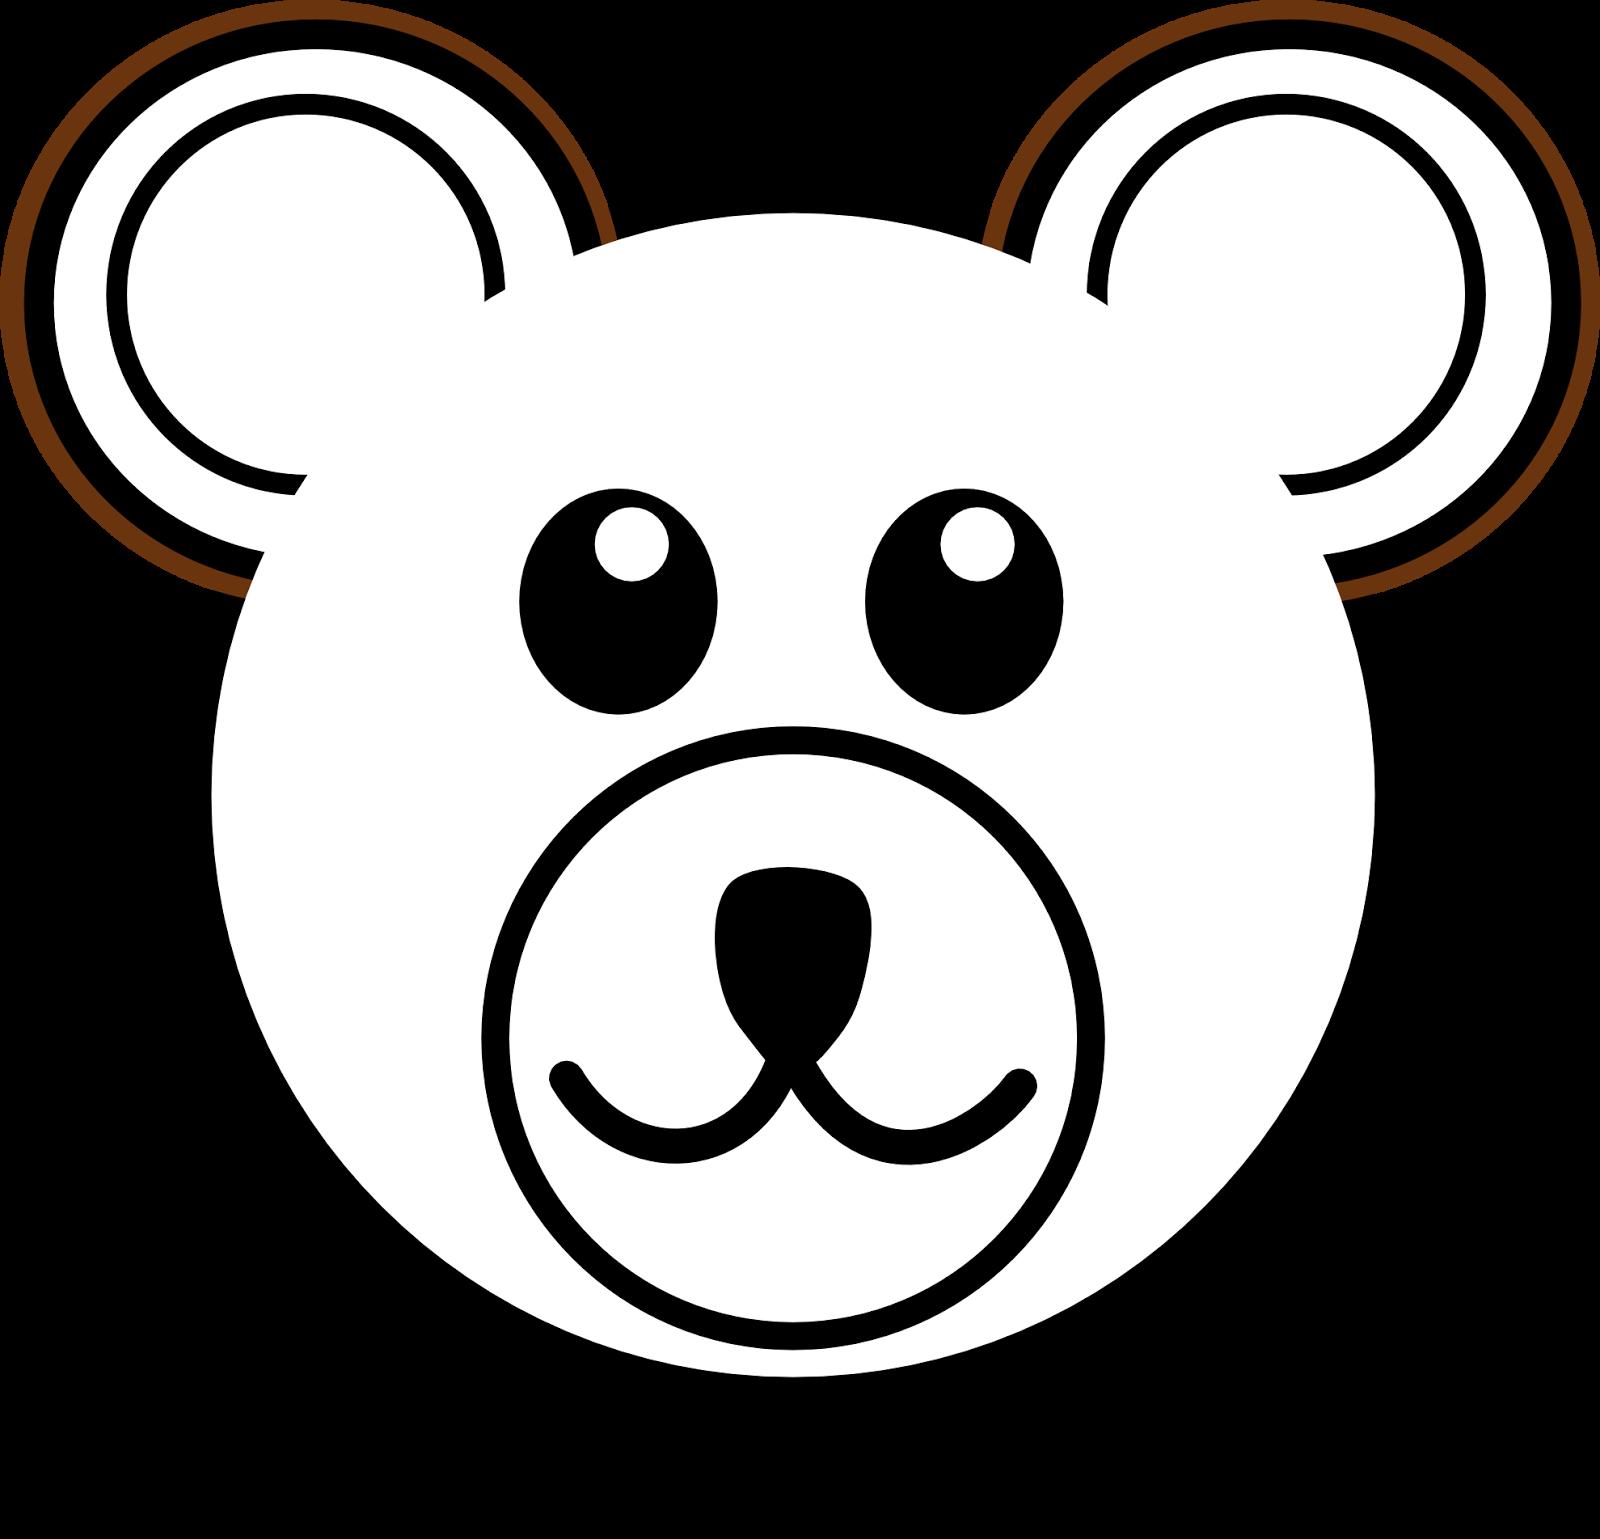 Bear clipart easy Free Clip Outline Bear Art